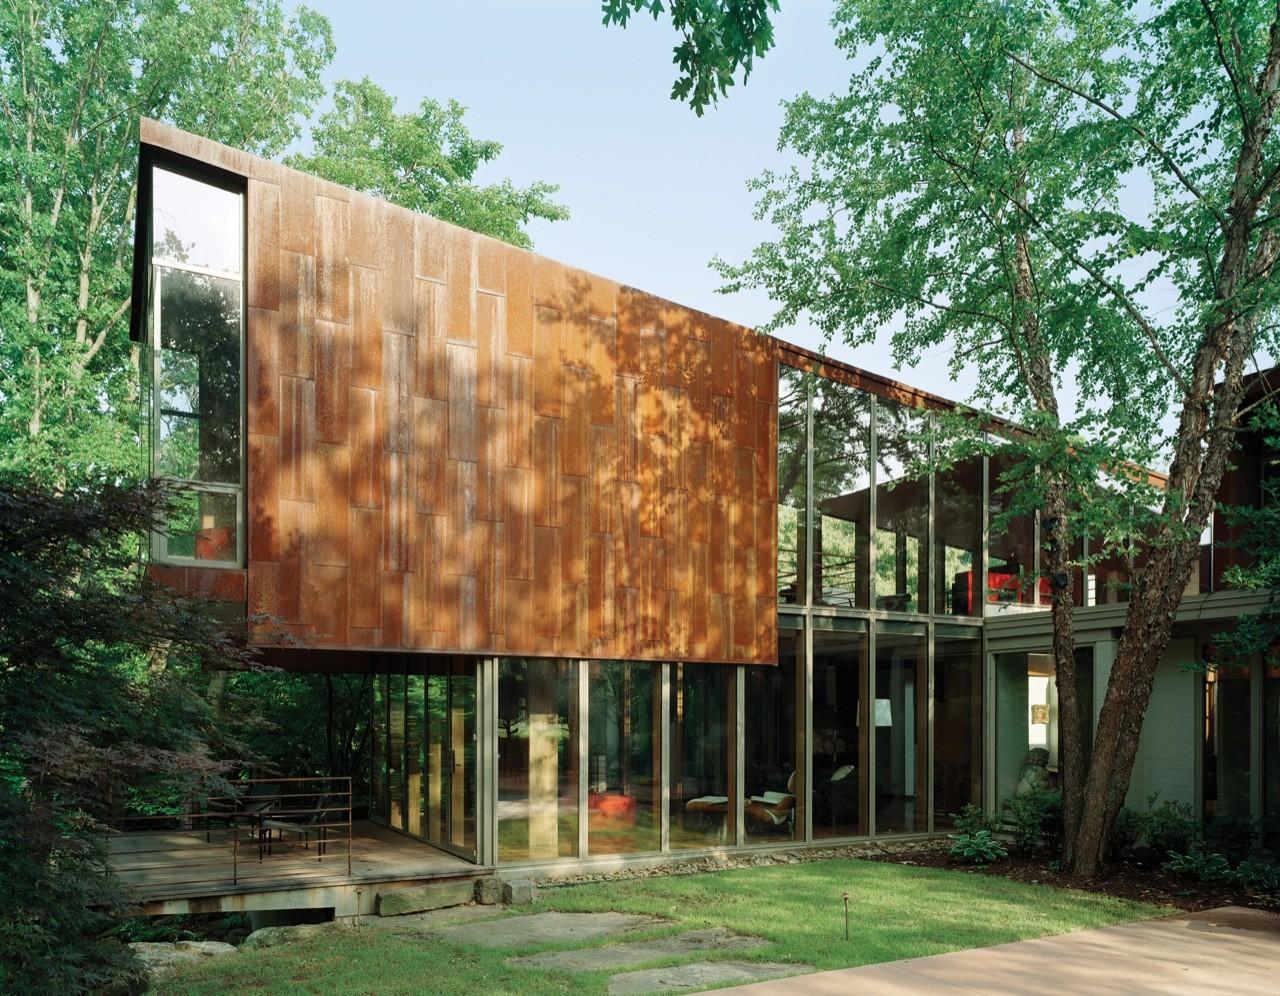 Galería de Casa Arkansas / Marlon Blackwell Architect - 2